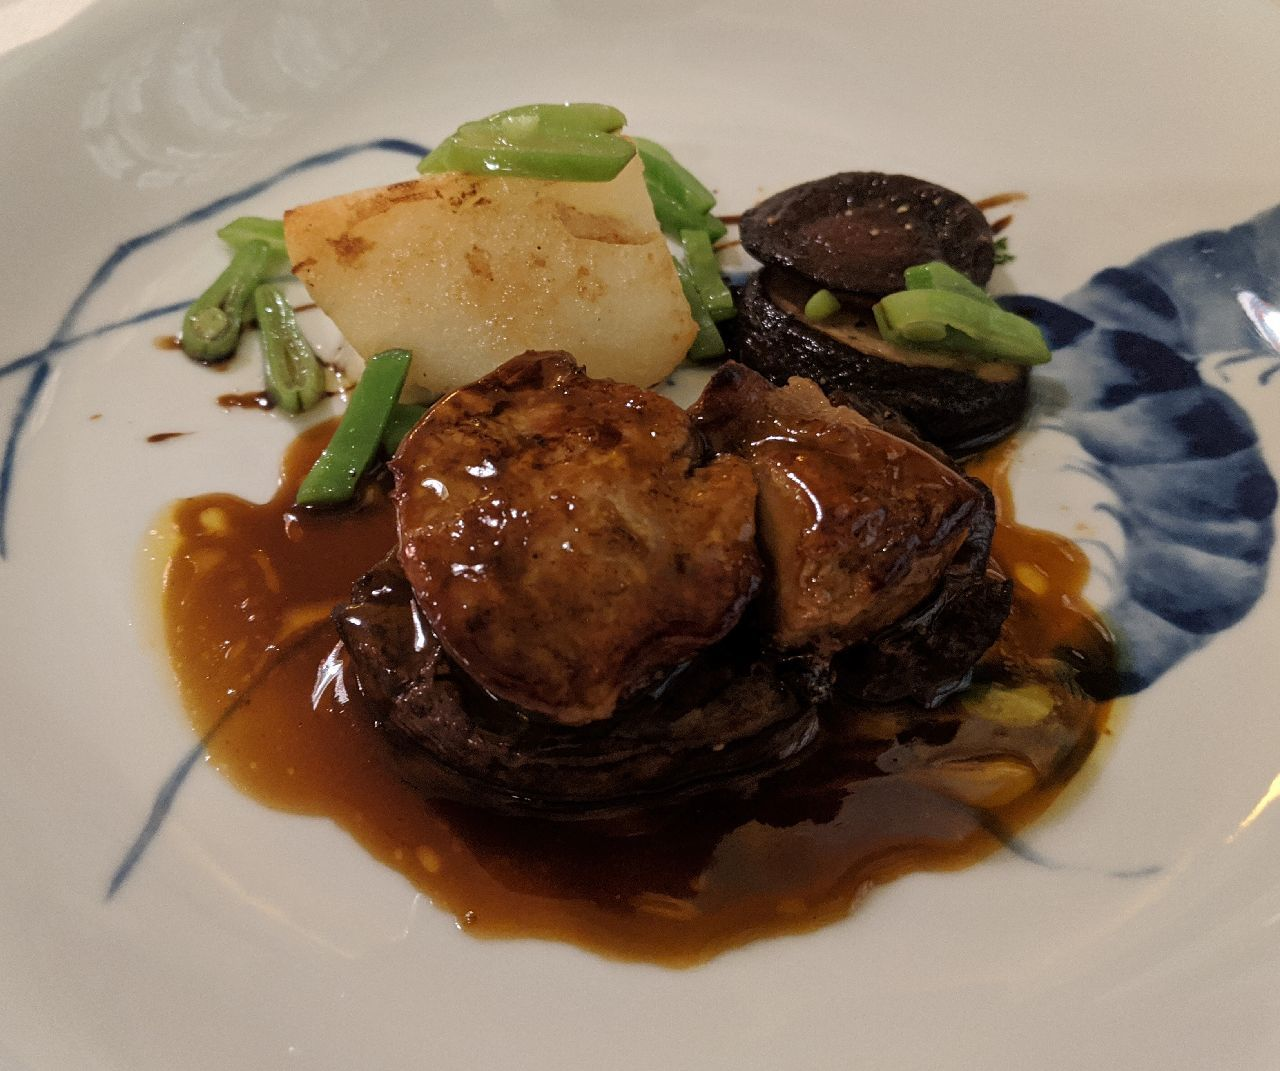 MVIMG_20200530_192258_1国産・牛フィレ肉のステーキ、フォアグラ乗せ、黒胡椒ソース、ポテトと椎茸のオープン焼き、ブルギニョン風